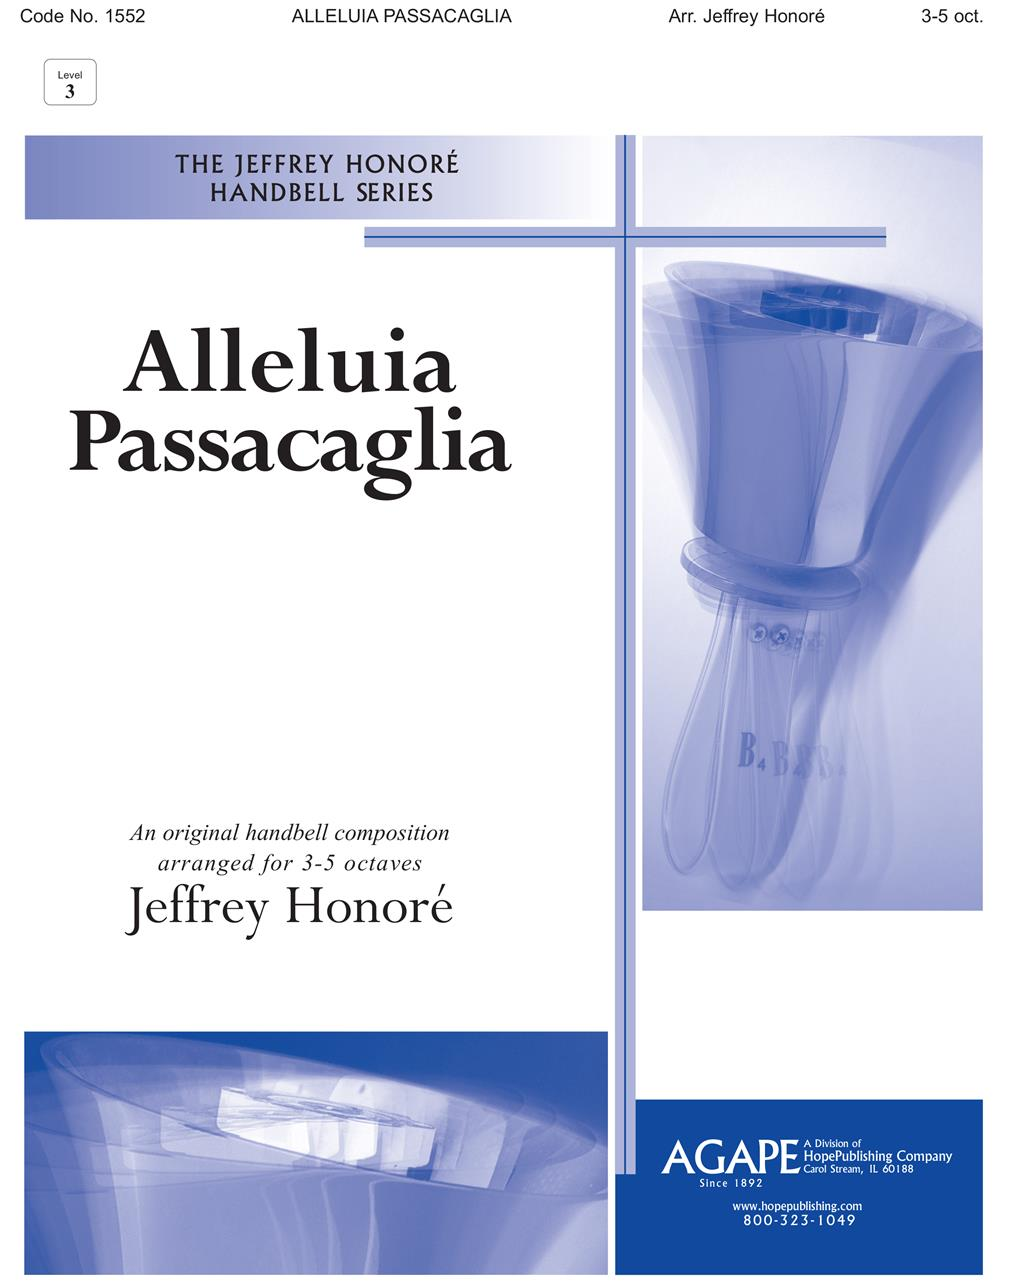 Alleluia Passacaglia - 3-5 Oct. Cover Image